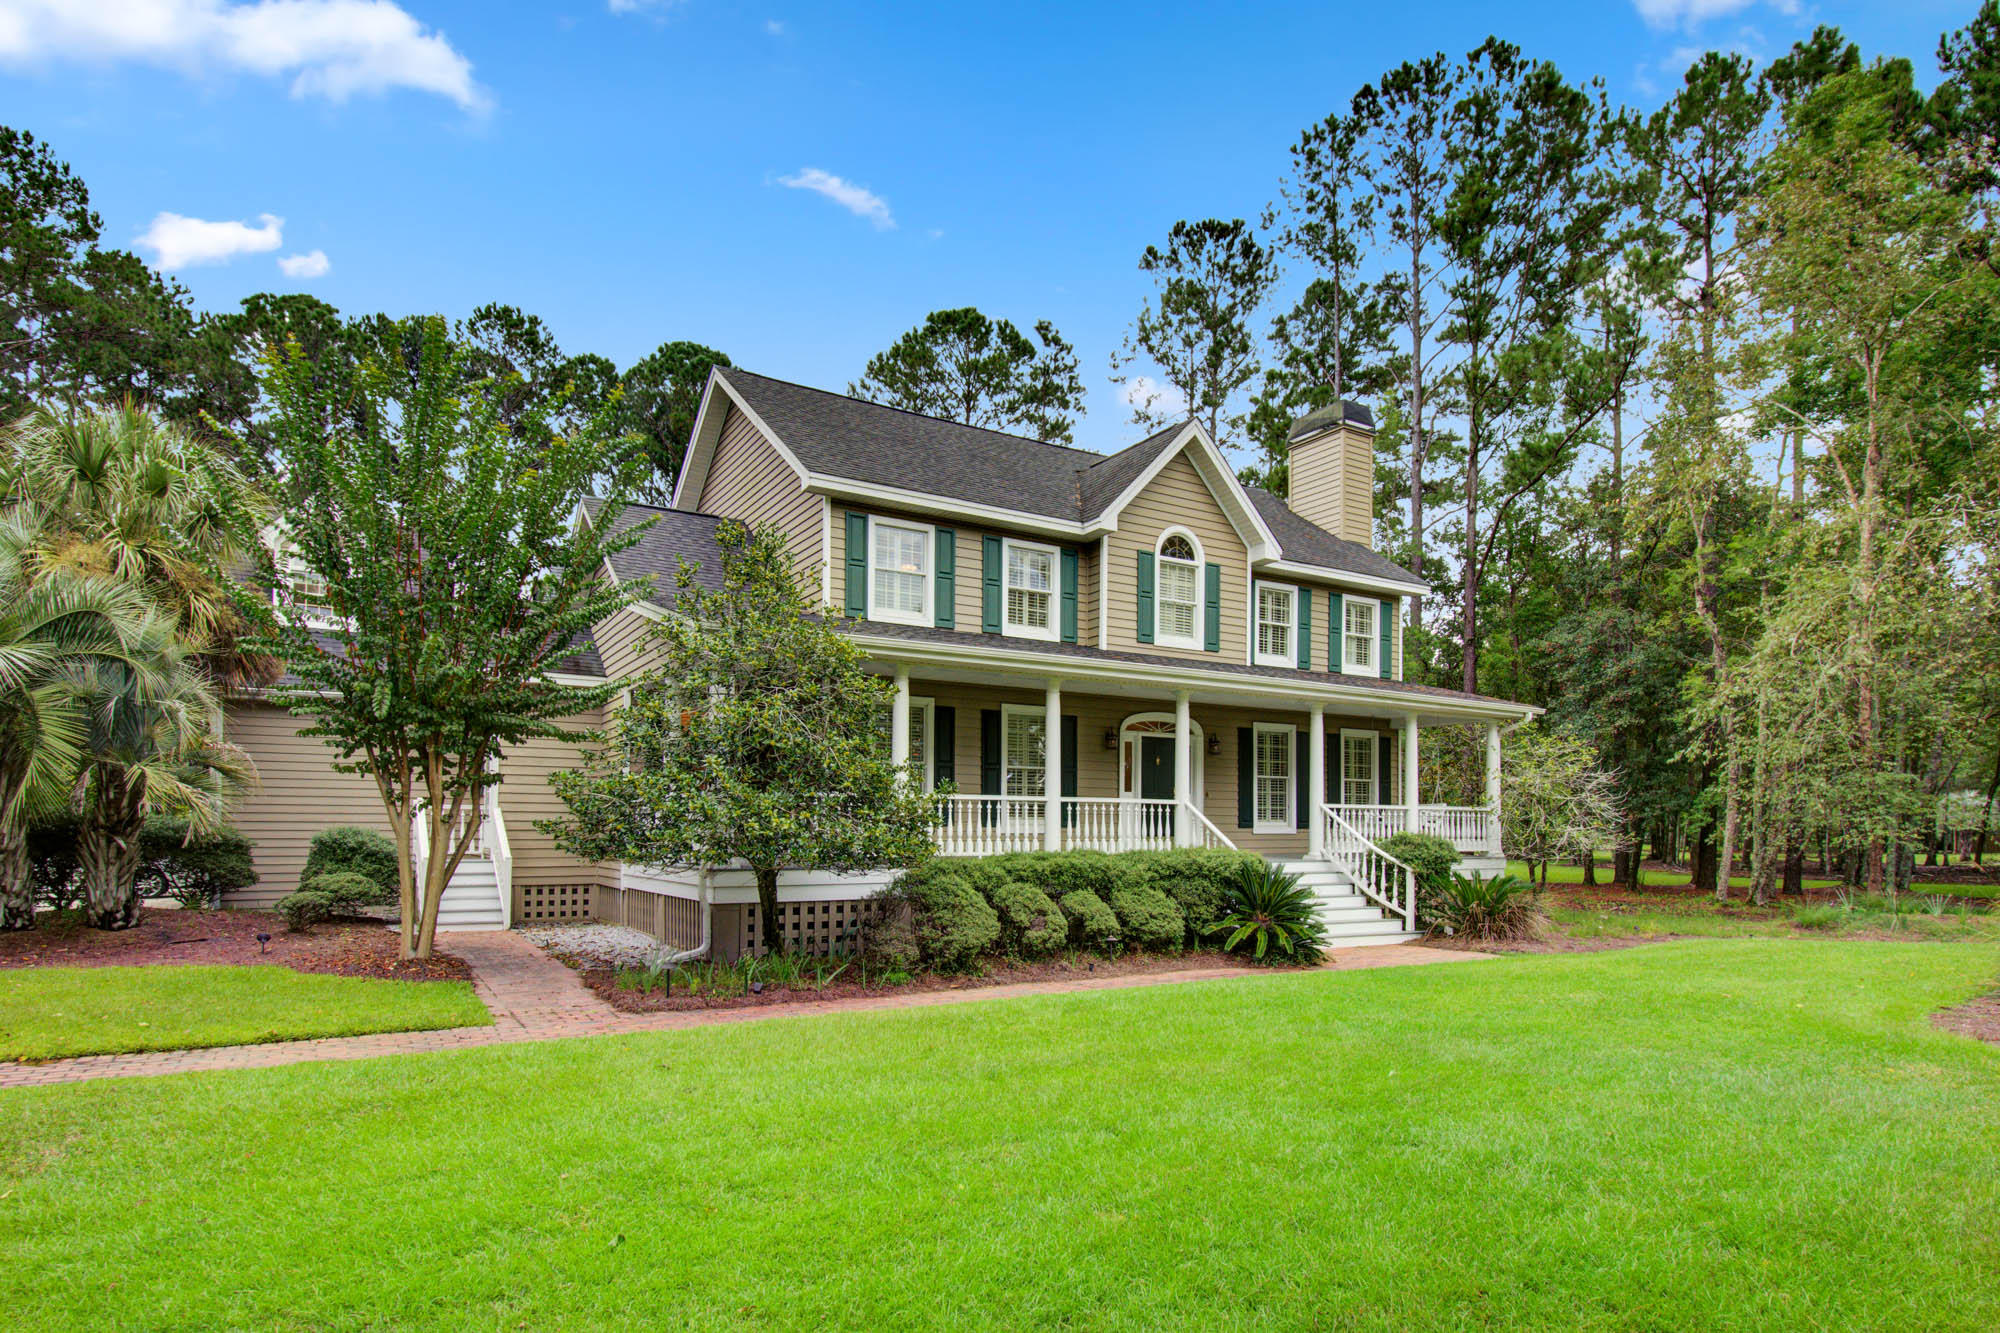 Dunes West Homes For Sale - 3515 Colonel Vanderhorst, Mount Pleasant, SC - 33